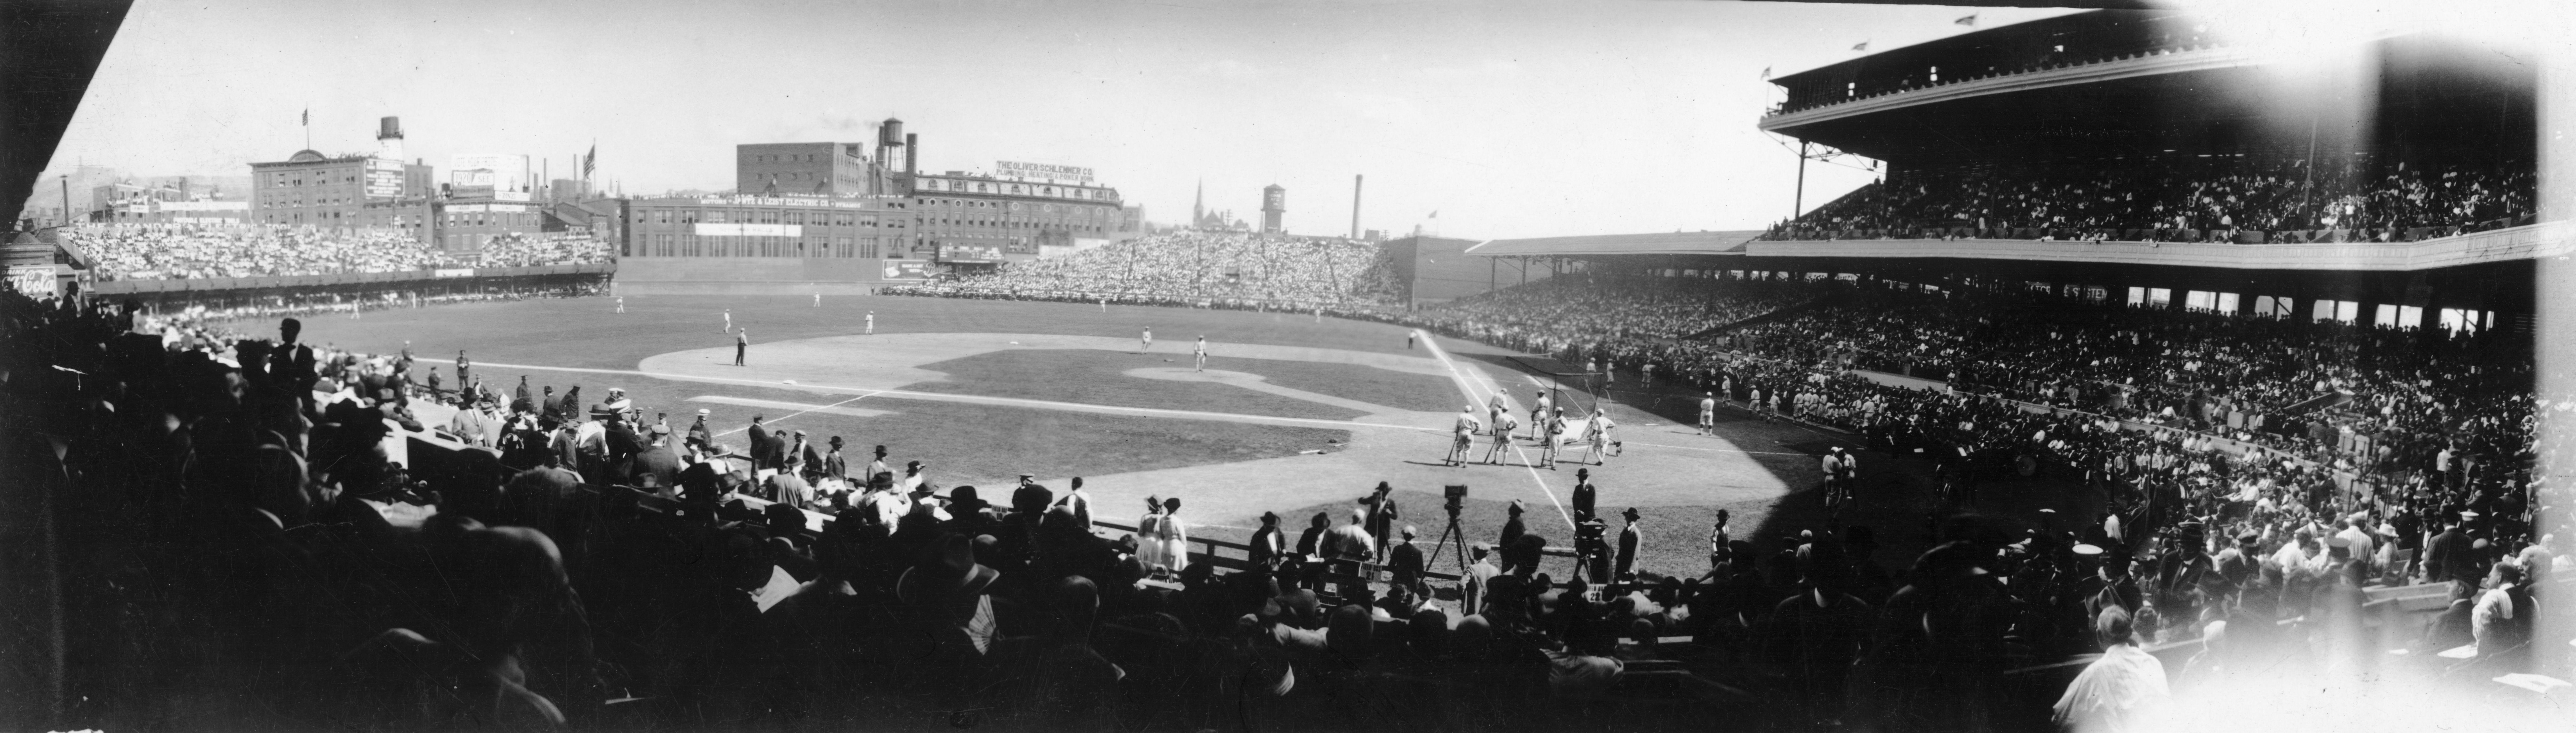 1919 Redland Field Vintage Cincinnati Reds Pinterest